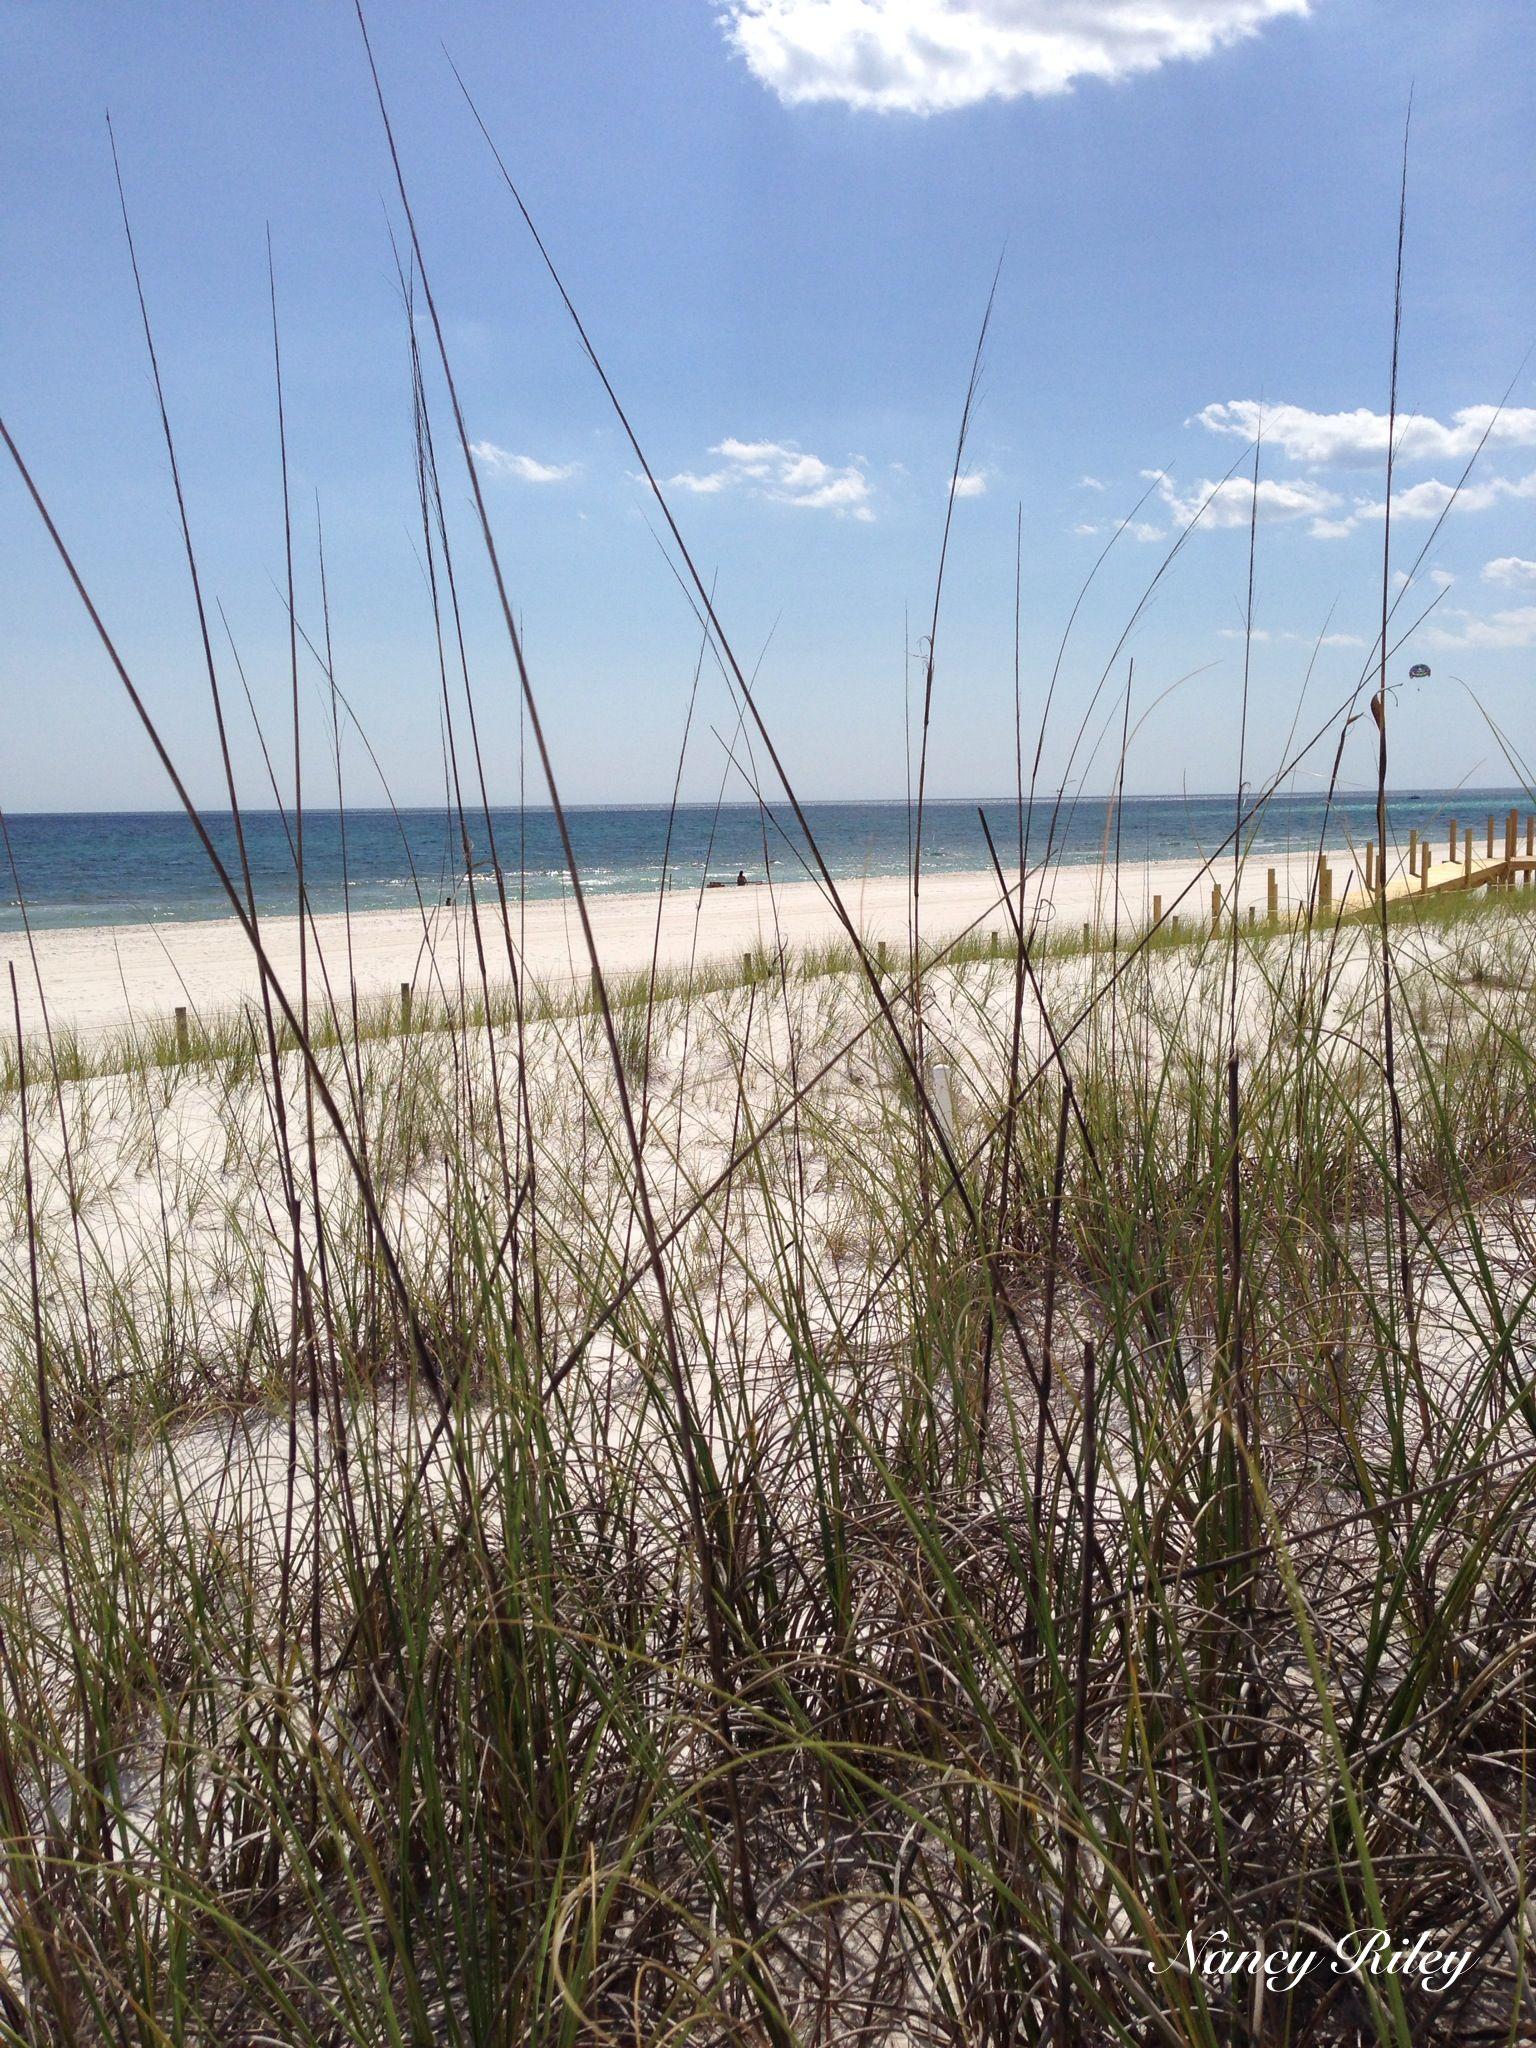 My Ocean View